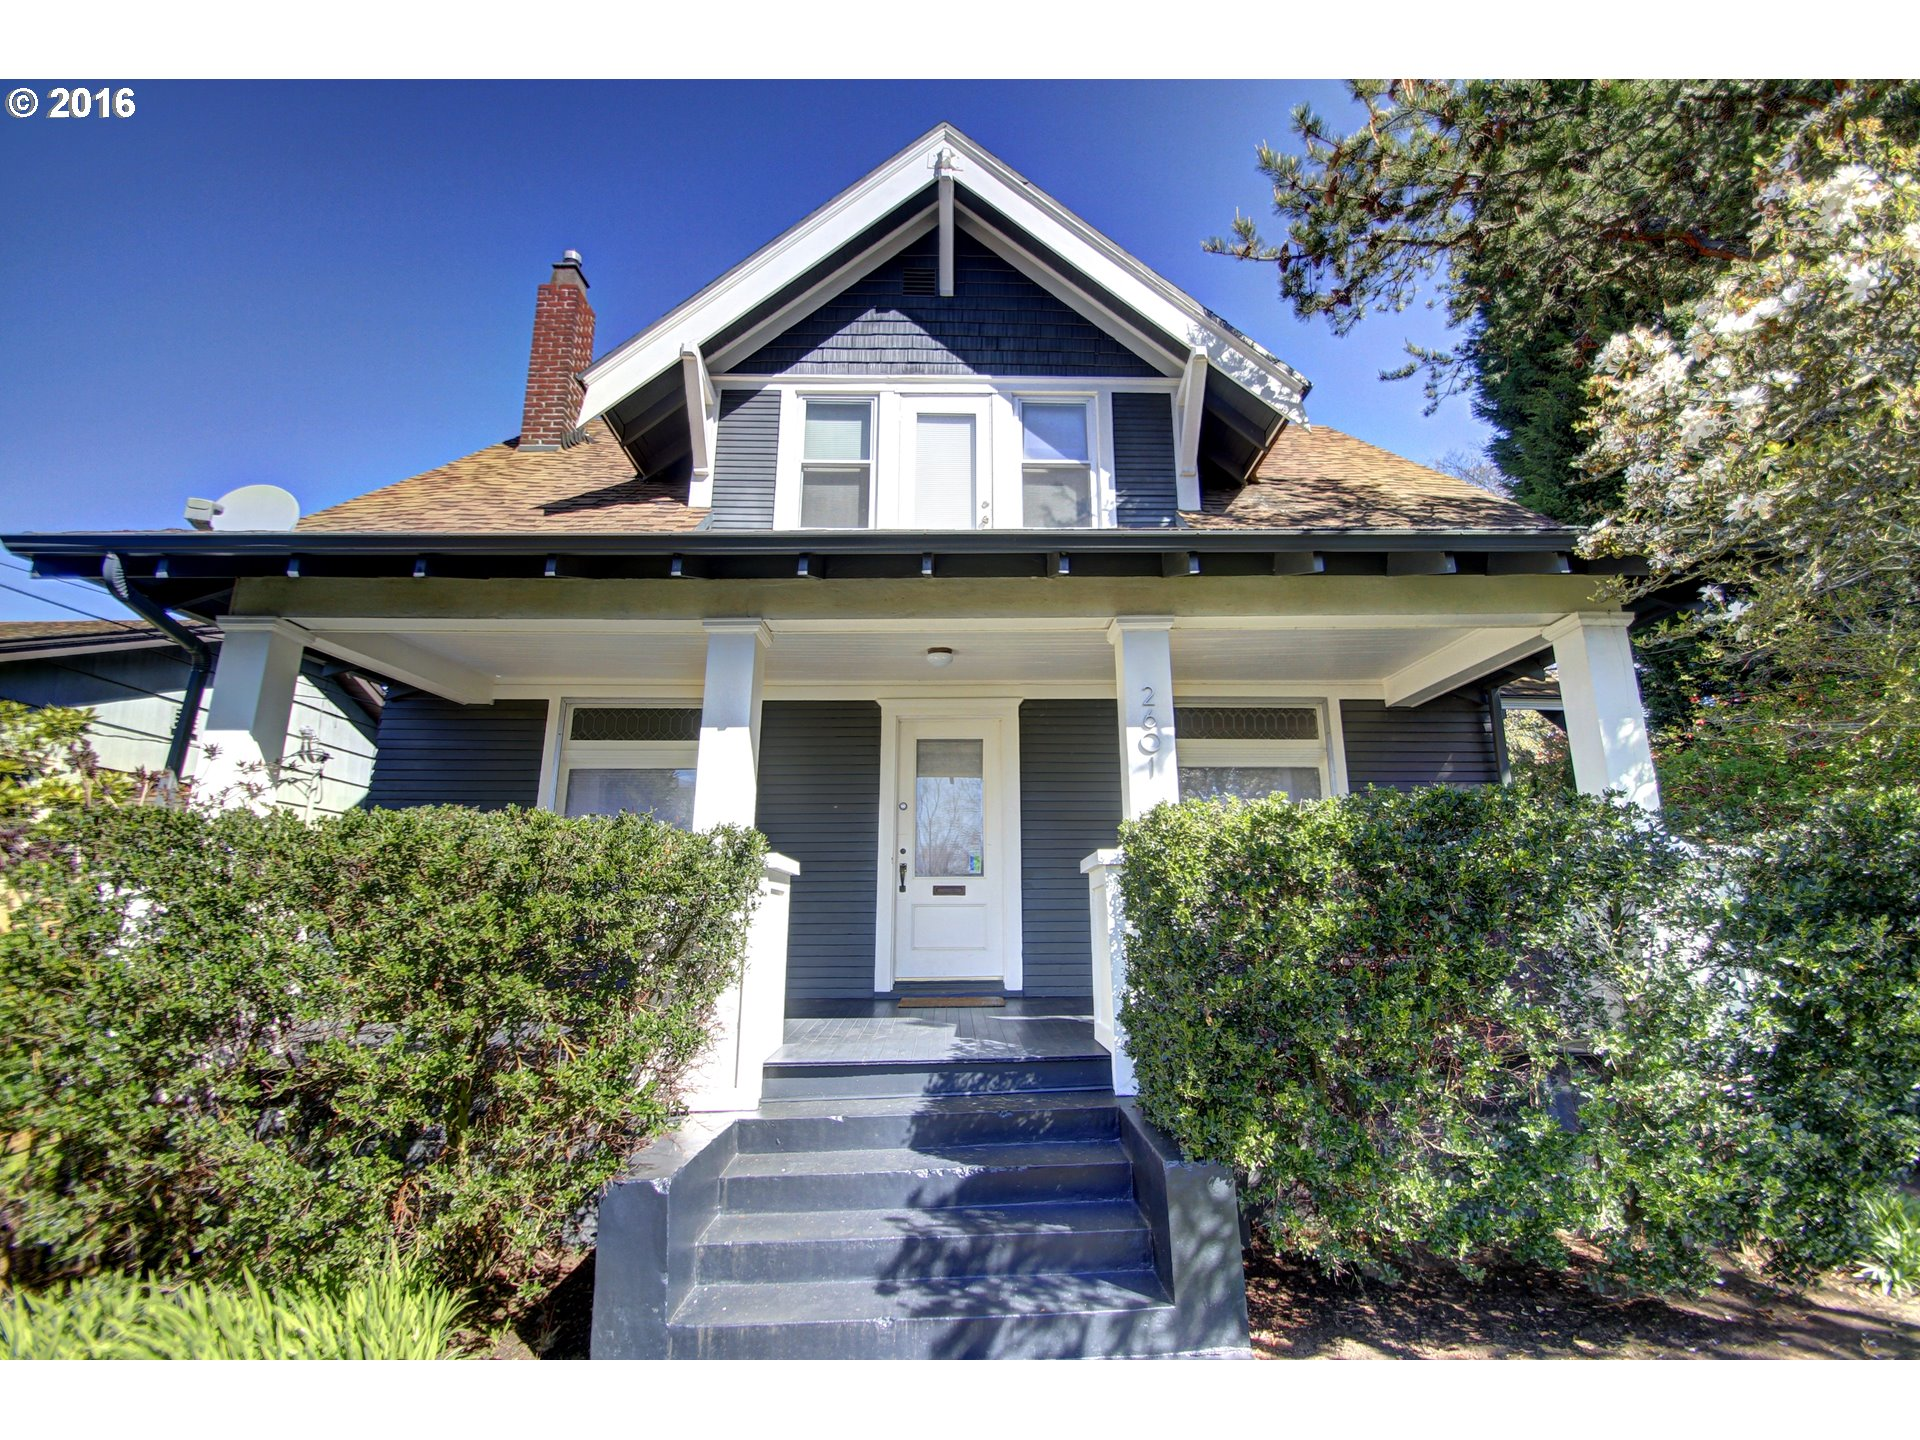 2601 N Sumner St, Portland, OR